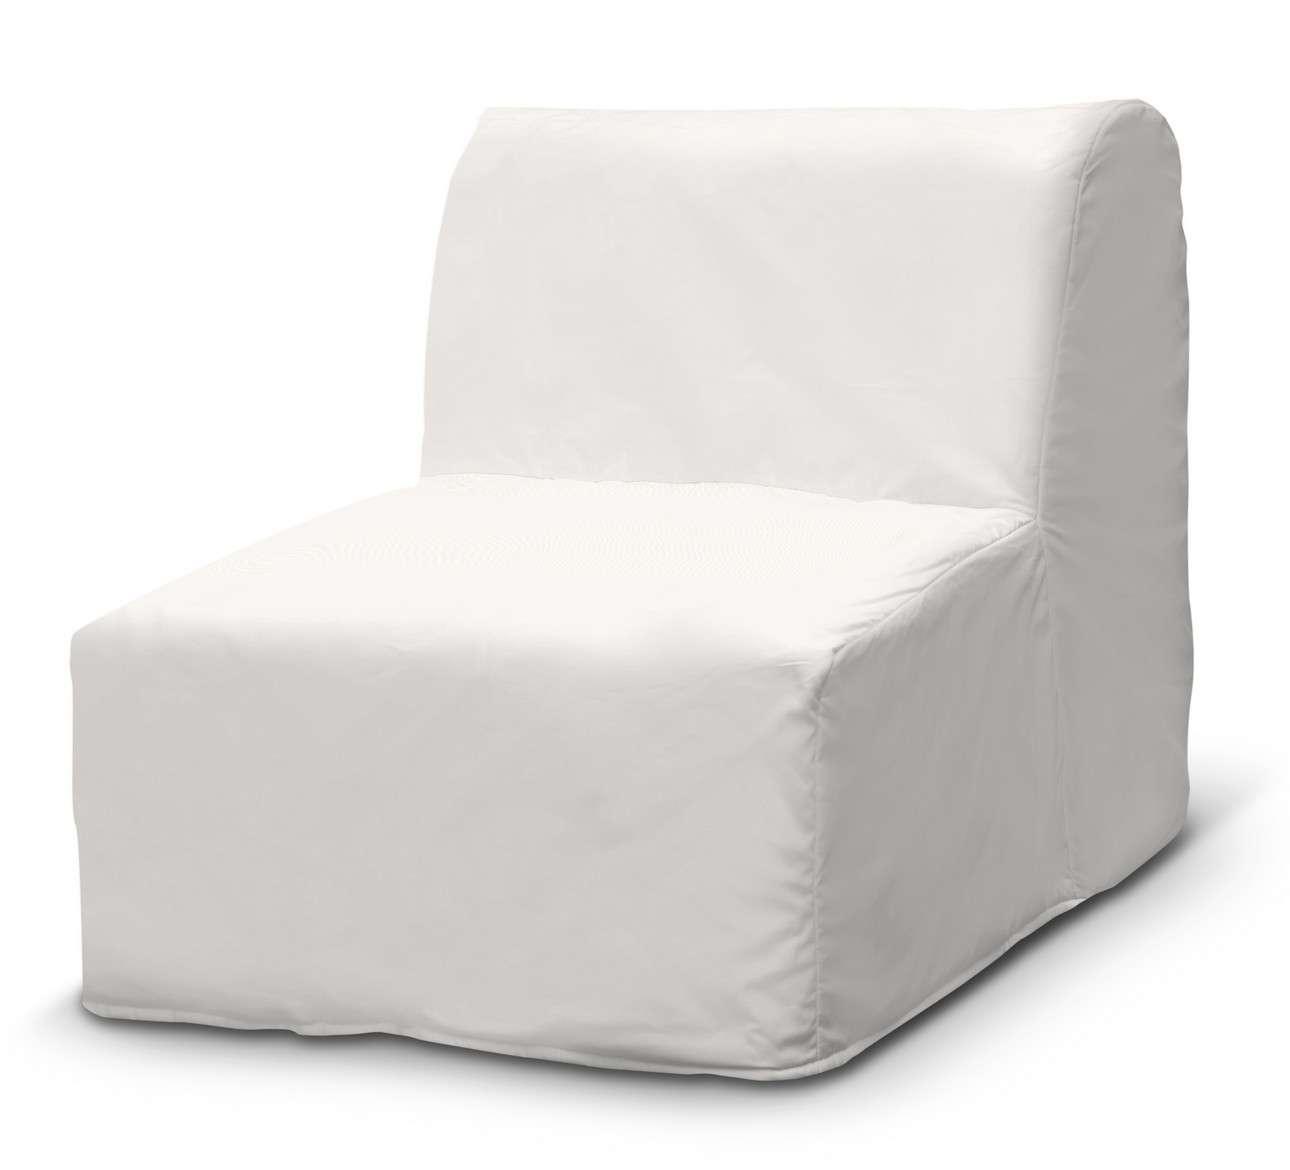 Lycksele Sesselbezug fotel Lycksele von der Kollektion Cotton Panama, Stoff: 702-34